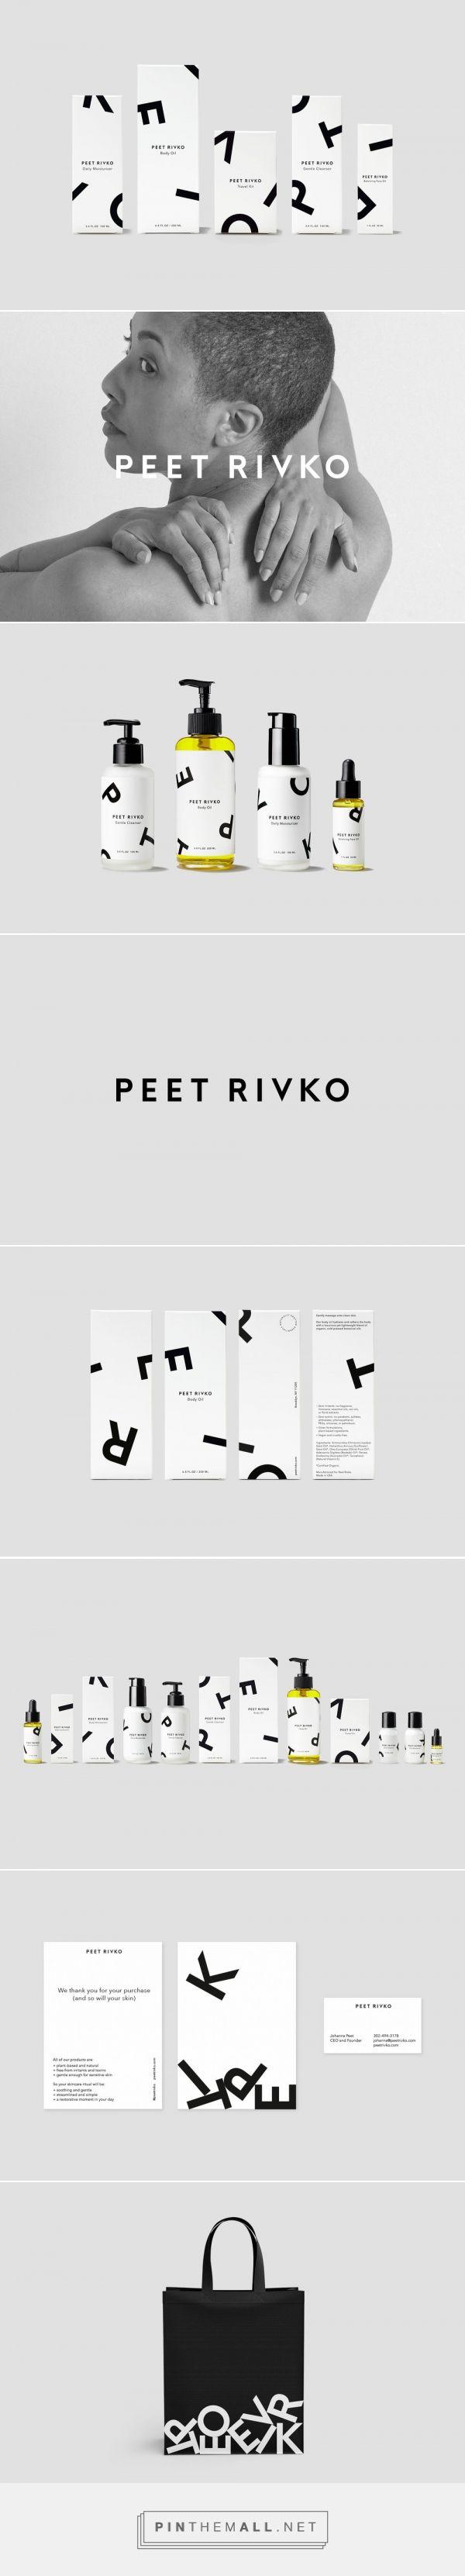 Peet Rivko Sensitive Skin Care Branding and Packaging by Gunter Piekarski | Fivestar Branding Agency – Design and Branding Agency & Curated Inspiration Gallery - created on 2017-04-28 16:19:23